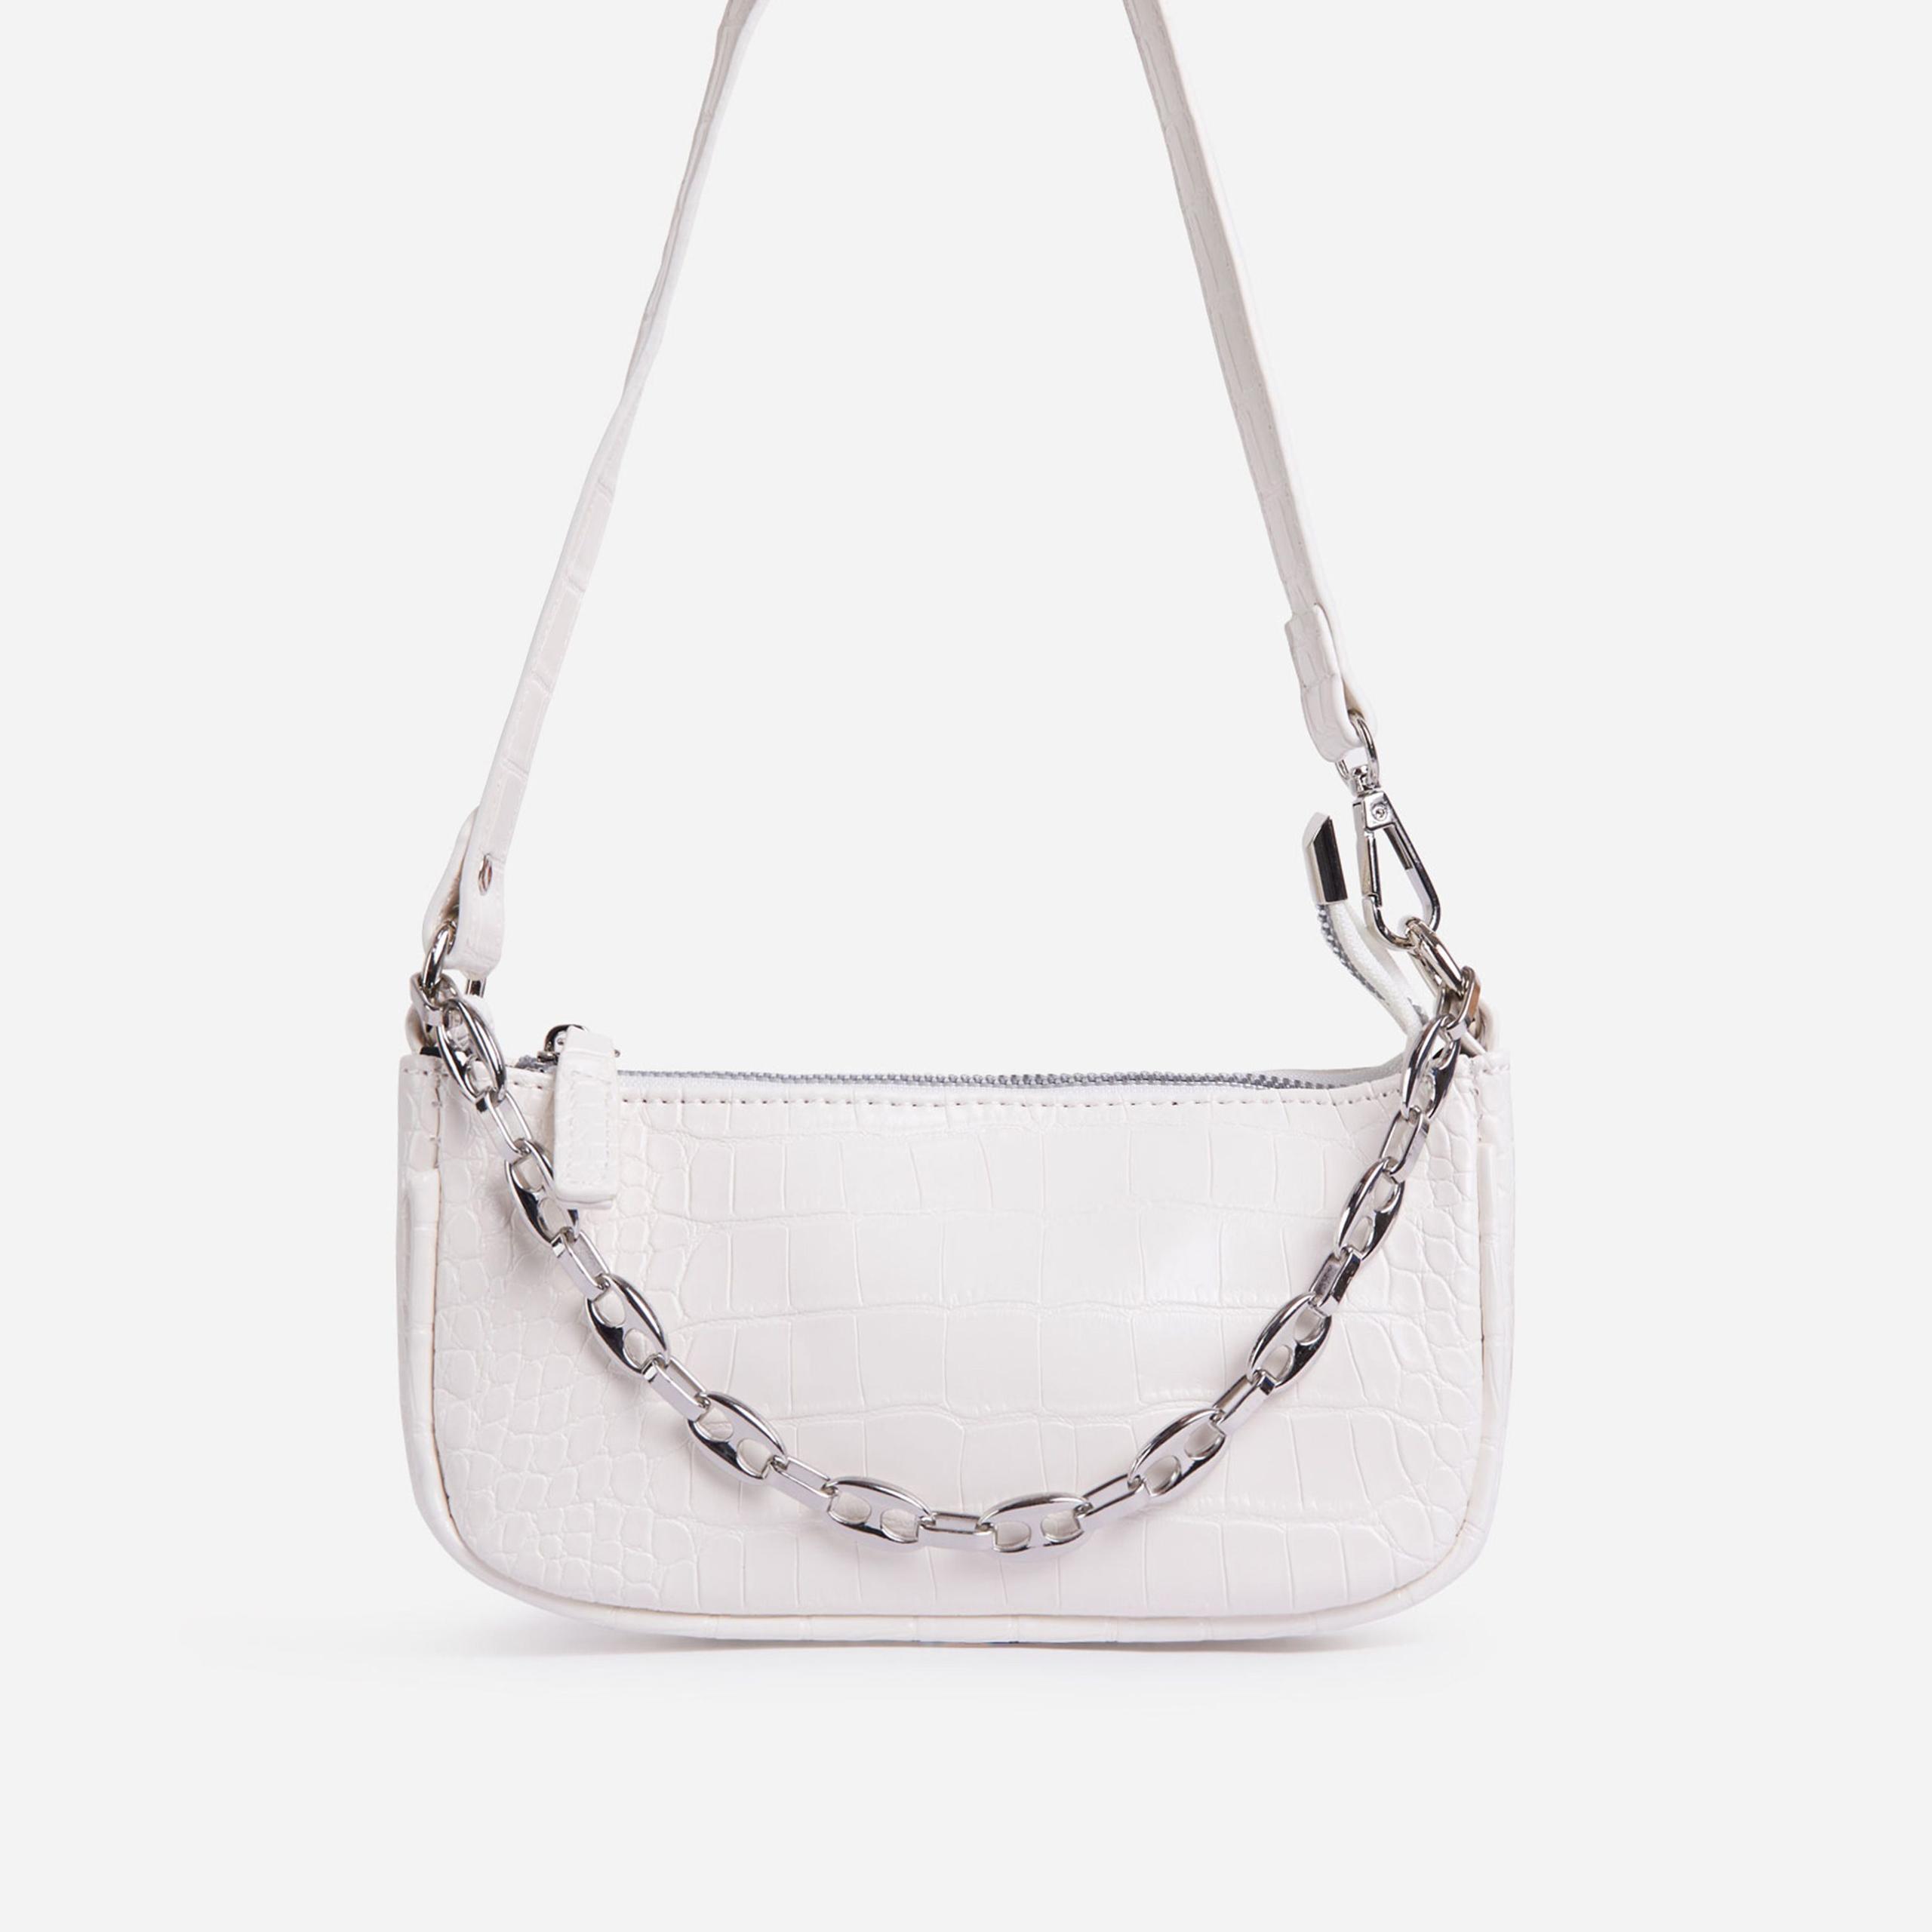 Daisy Chain Detail Baguette Bag In White Croc Print Faux